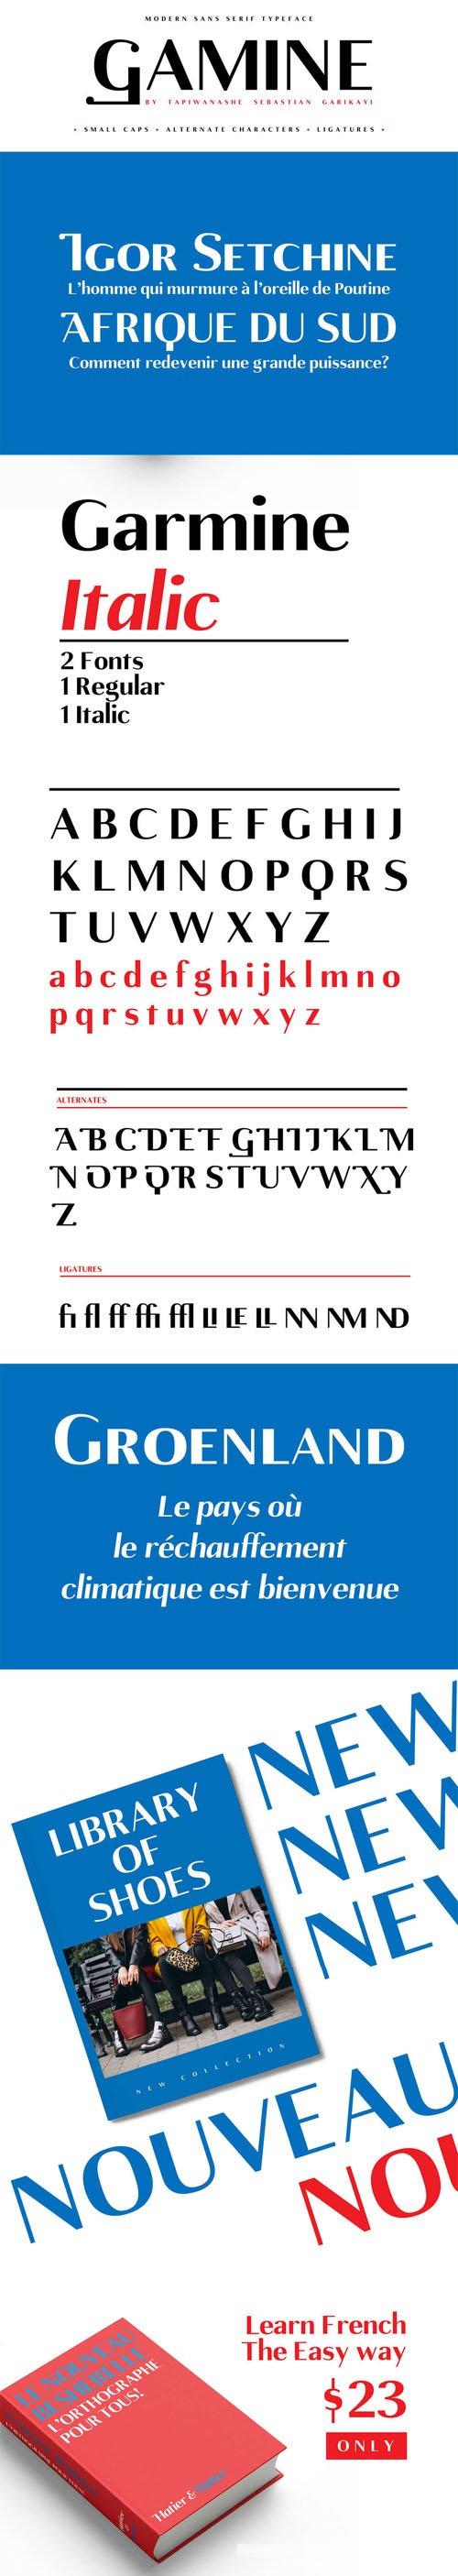 Gamine Modern Sans Serif Typeface